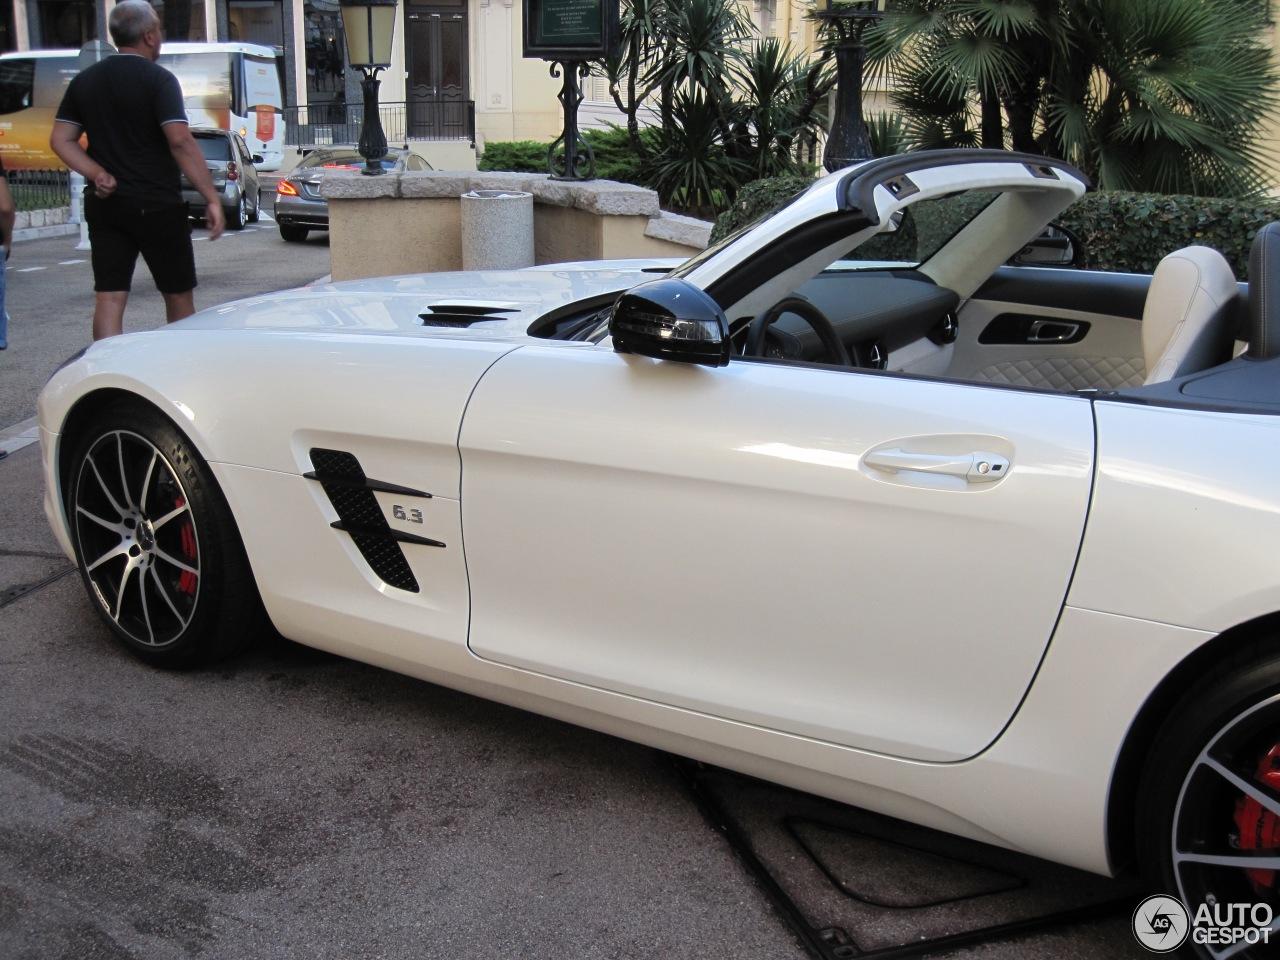 Mercedes benz sls amg gt roadster 23 august 2015 for 2015 mercedes benz sls amg convertible